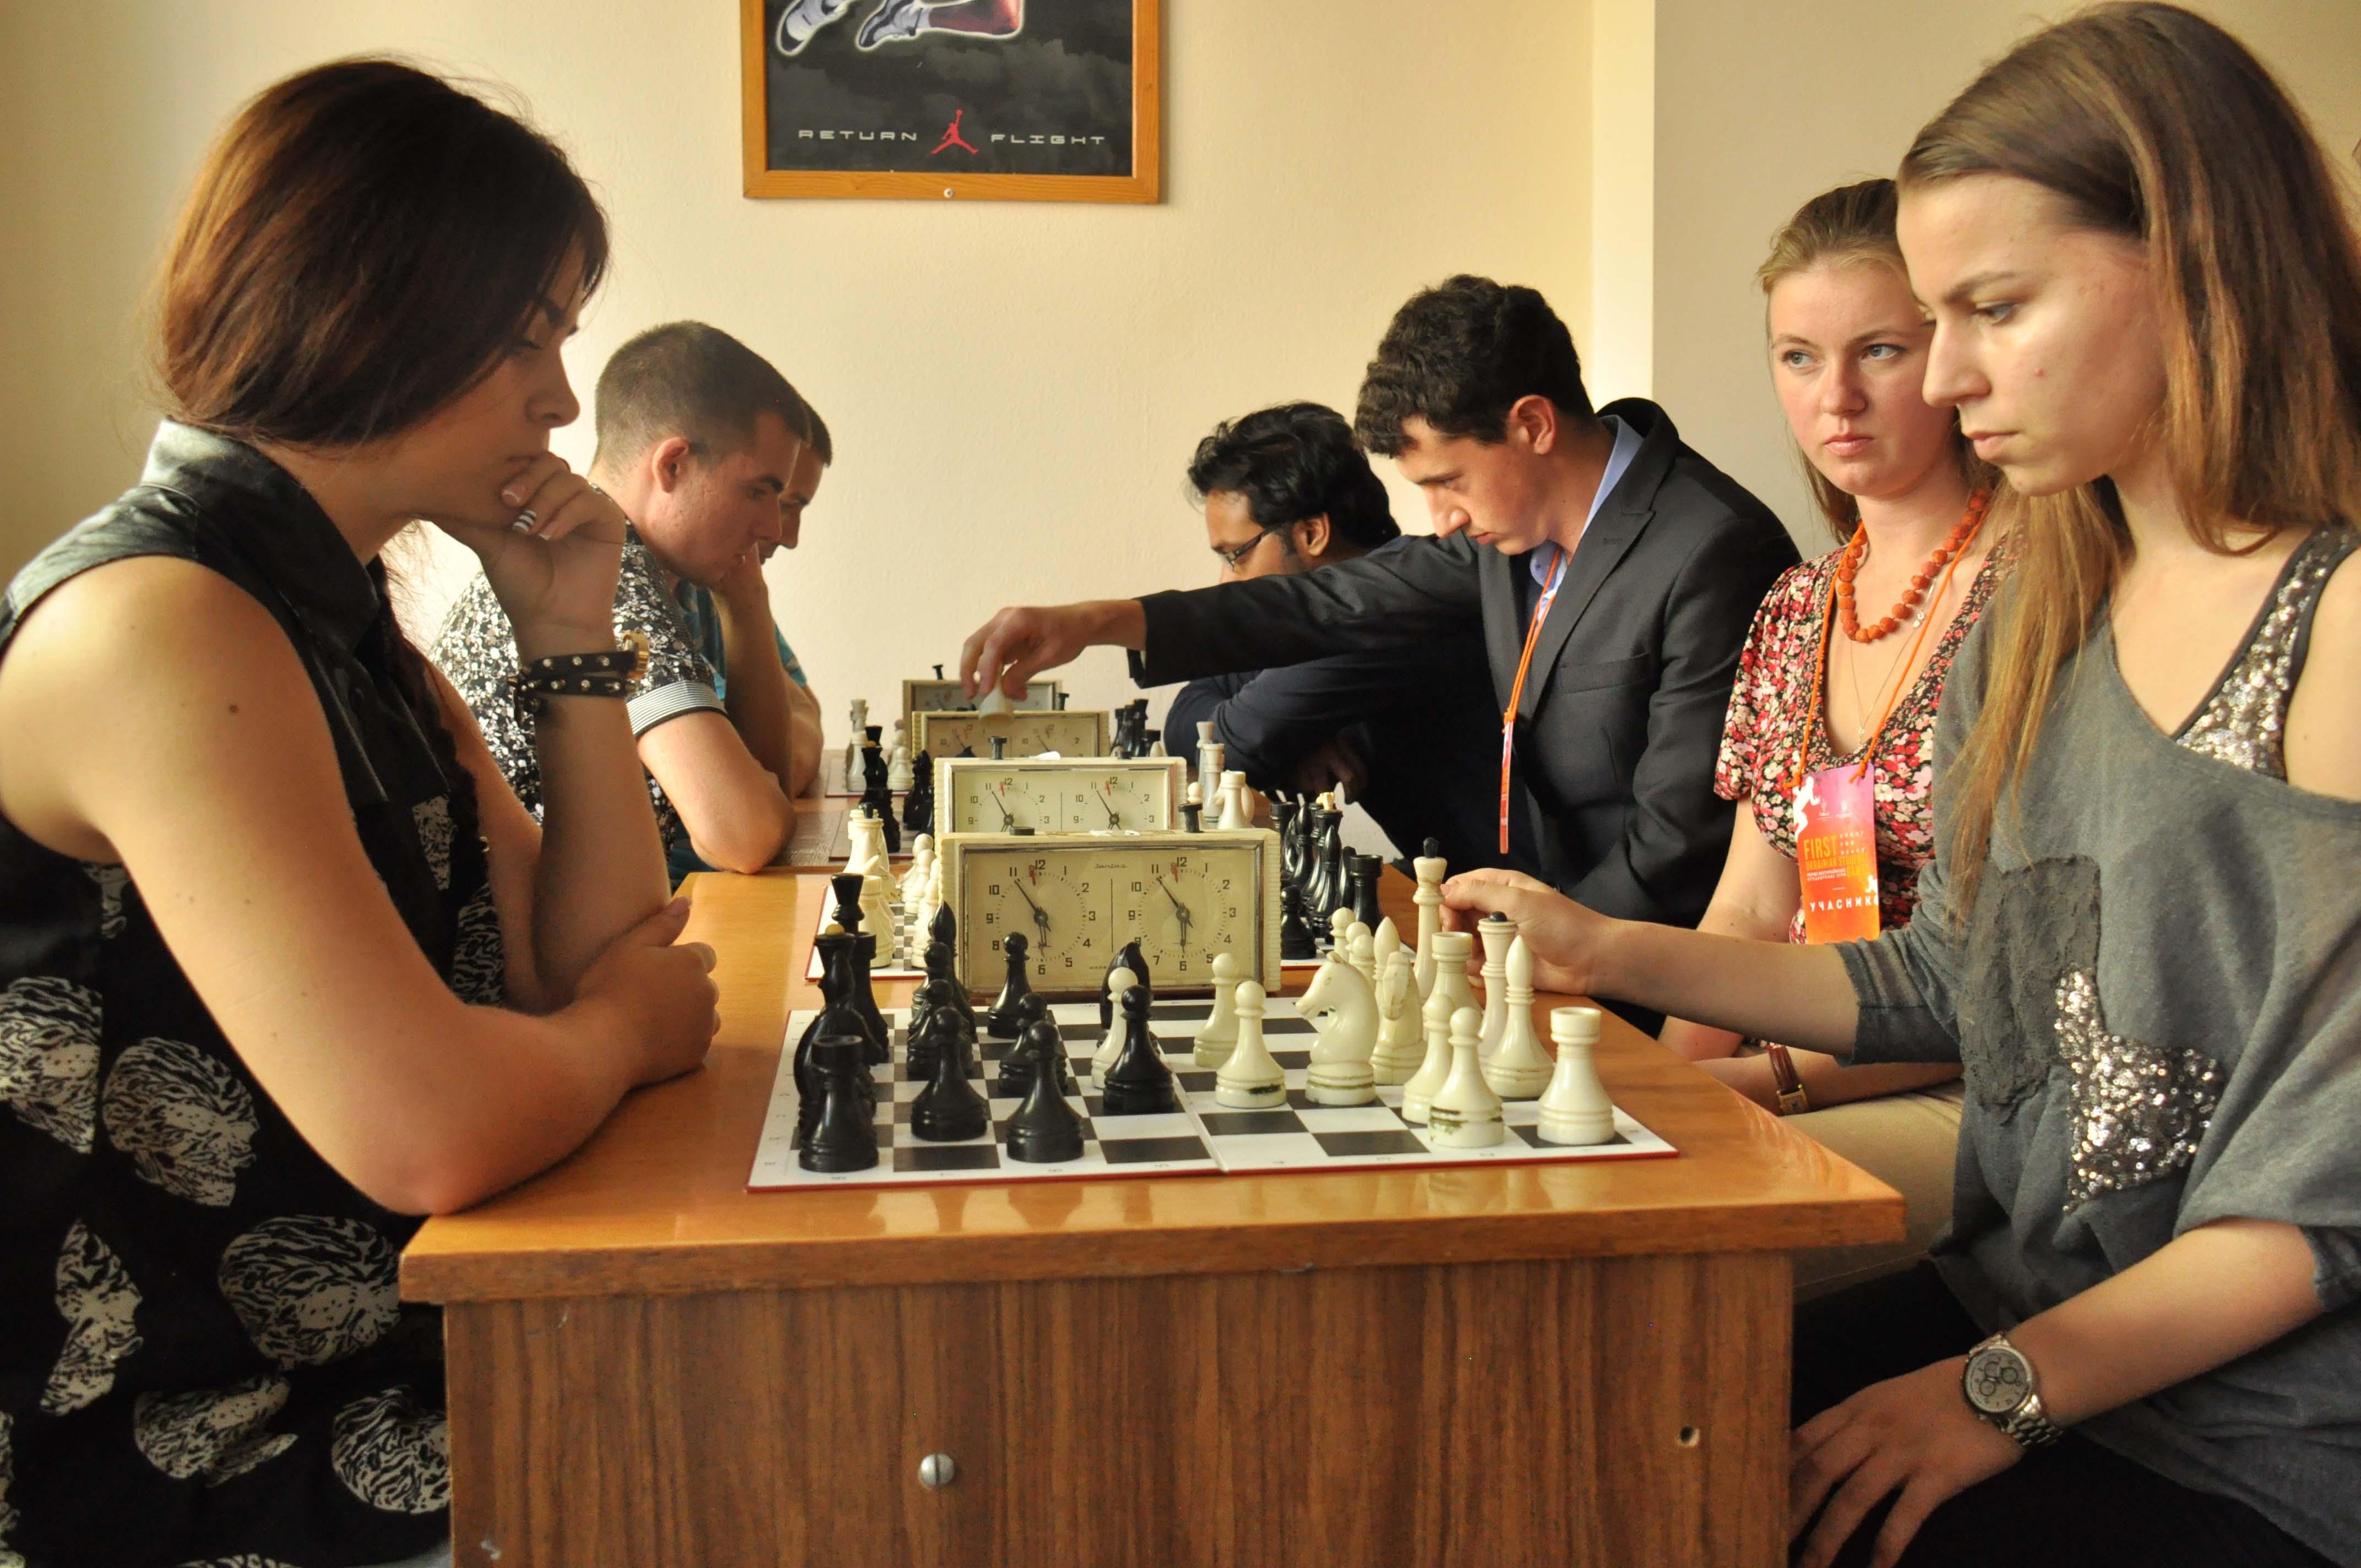 chess_stud